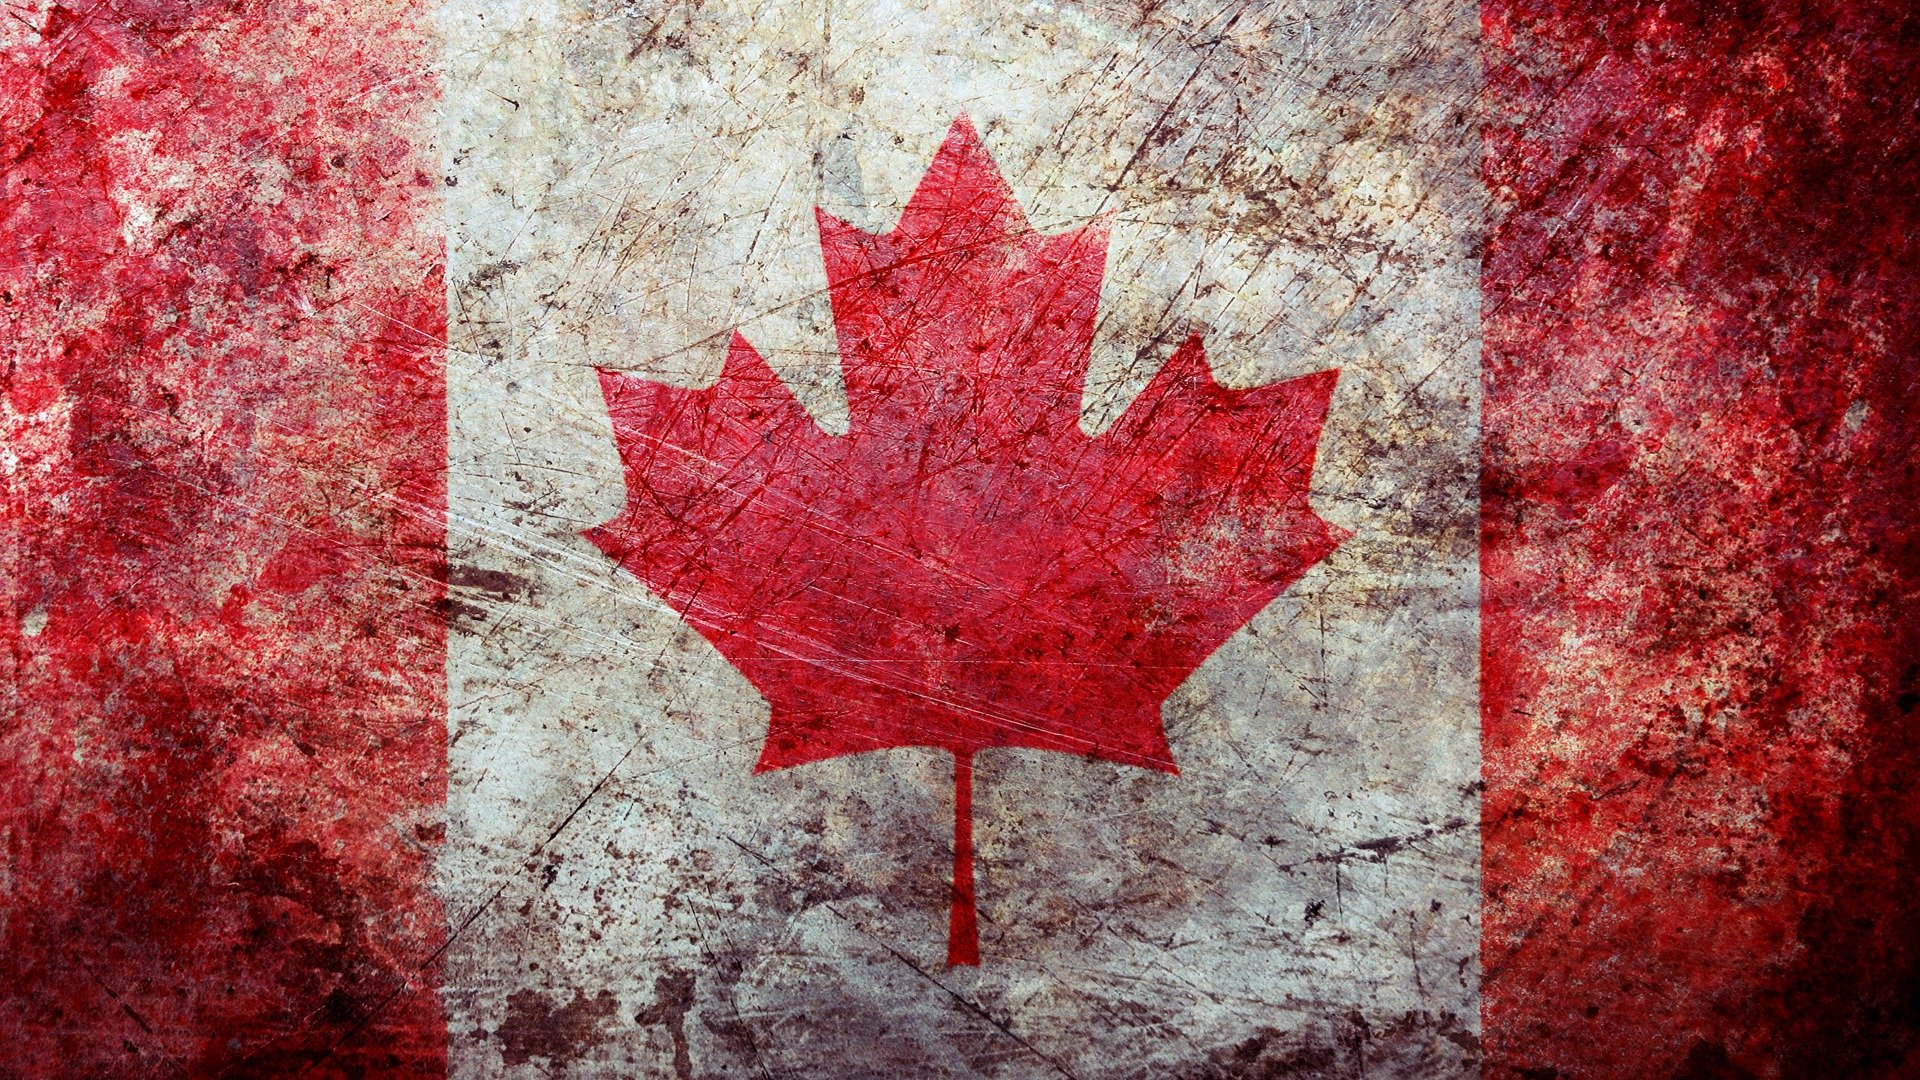 канадский флаг в картинках стиле лофт